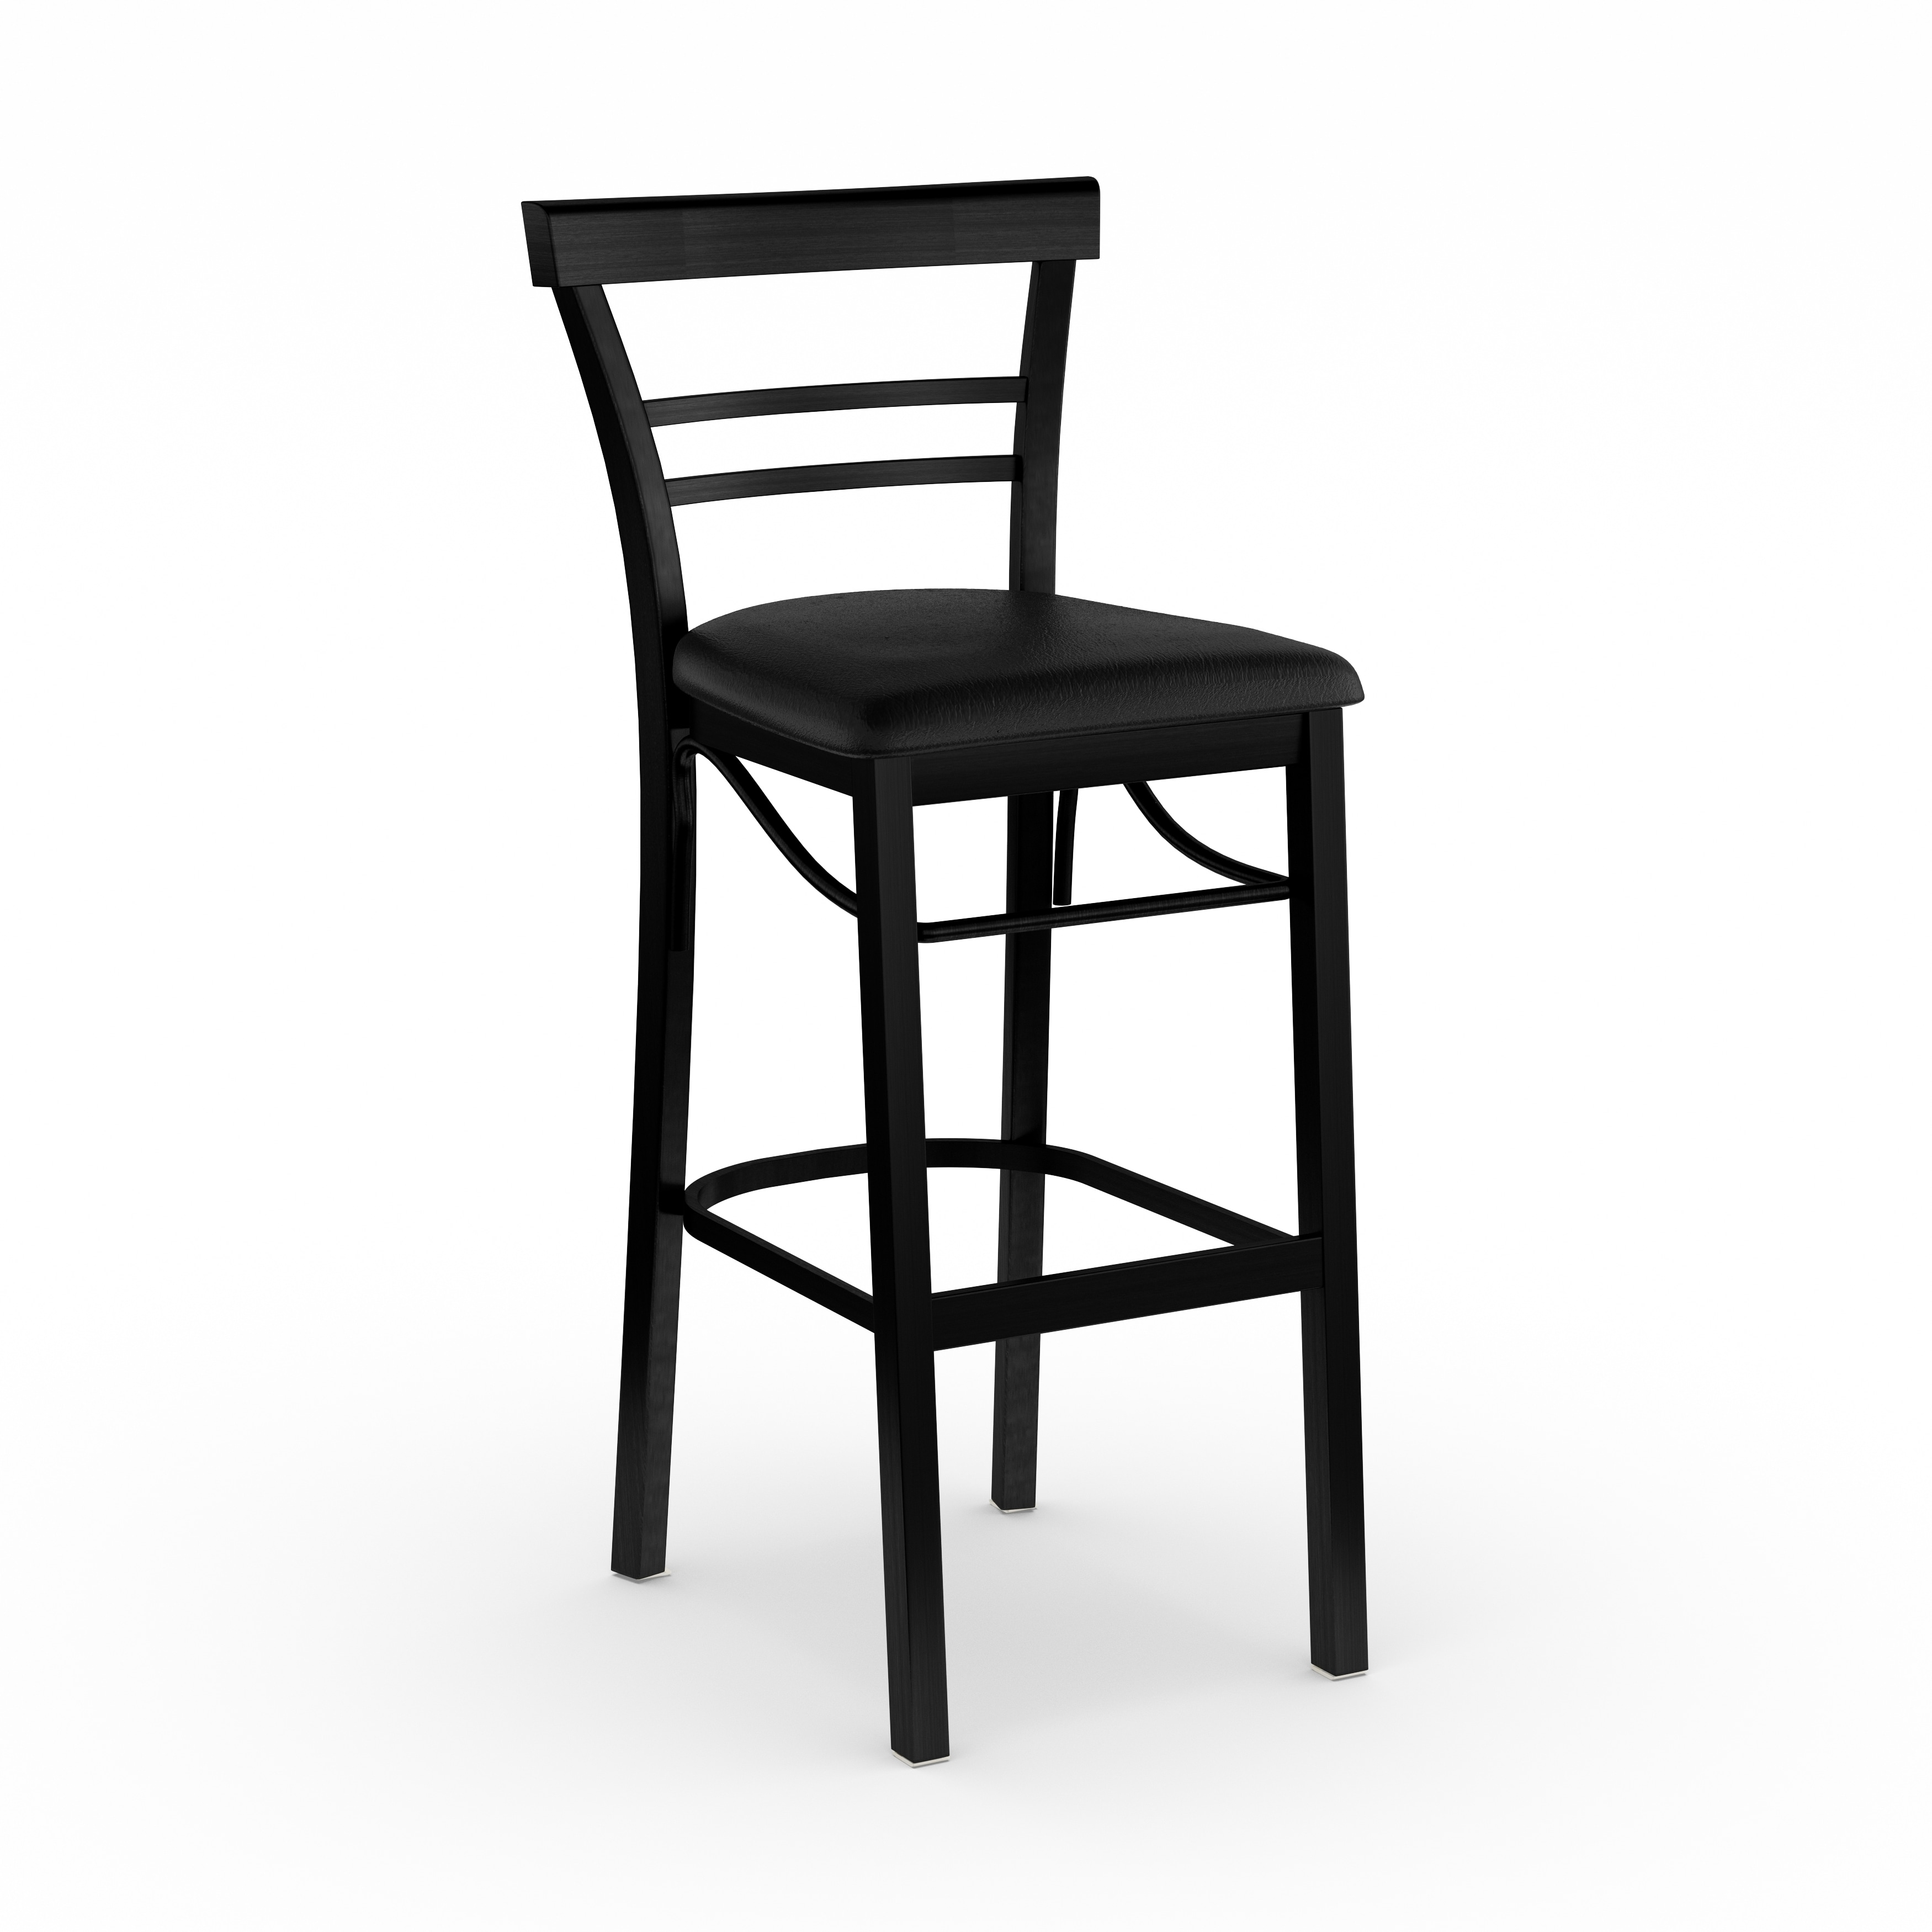 Shop porch den stonehurst lyndhurst heavy duty bar stool free shipping today overstock com 20340087